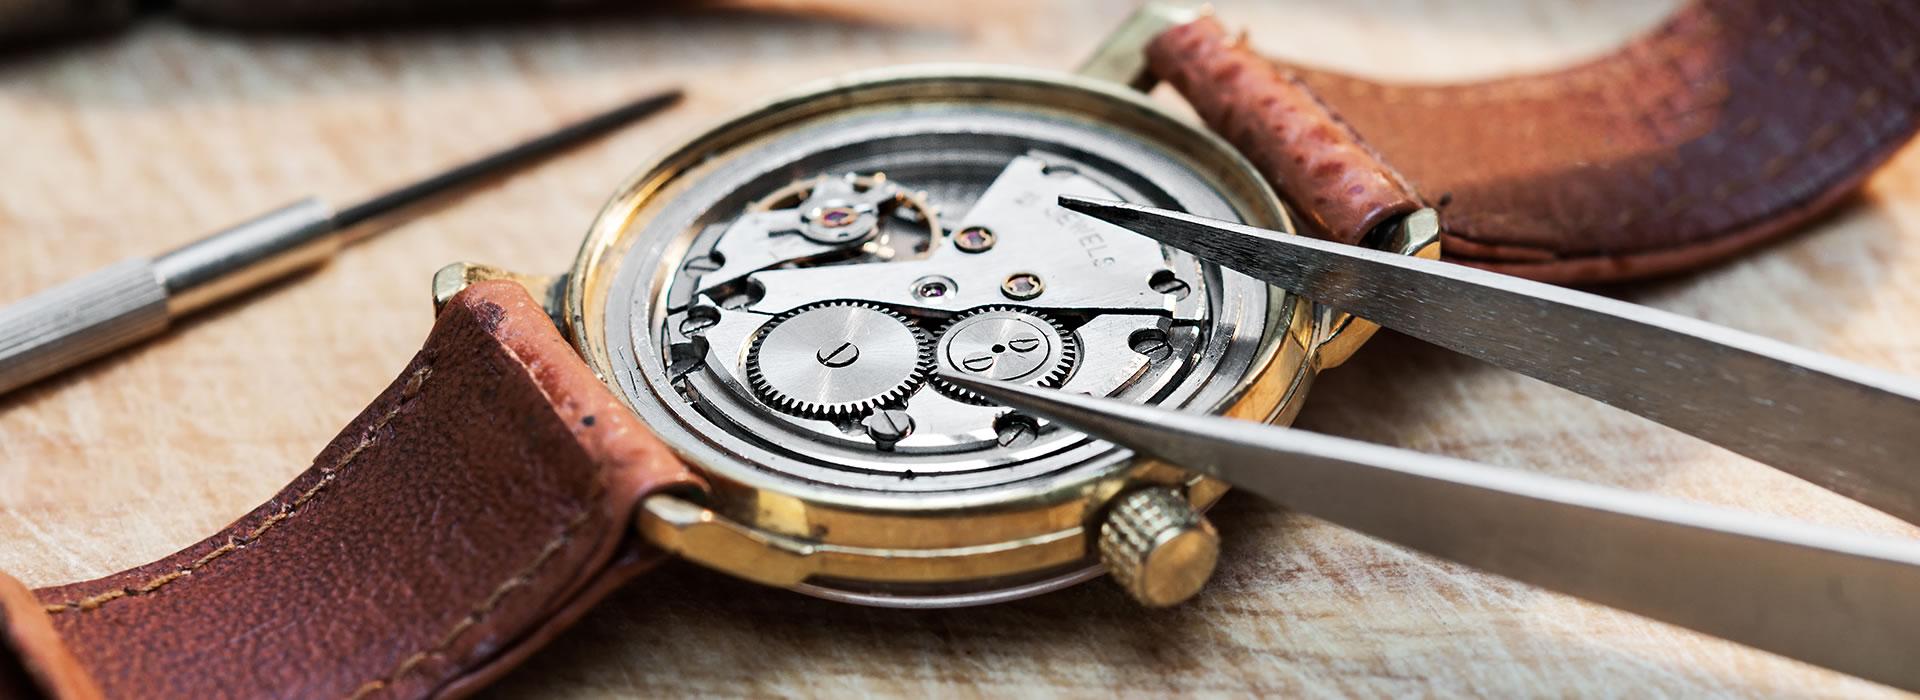 bijouterie horlogerie roux reparation montre horloge